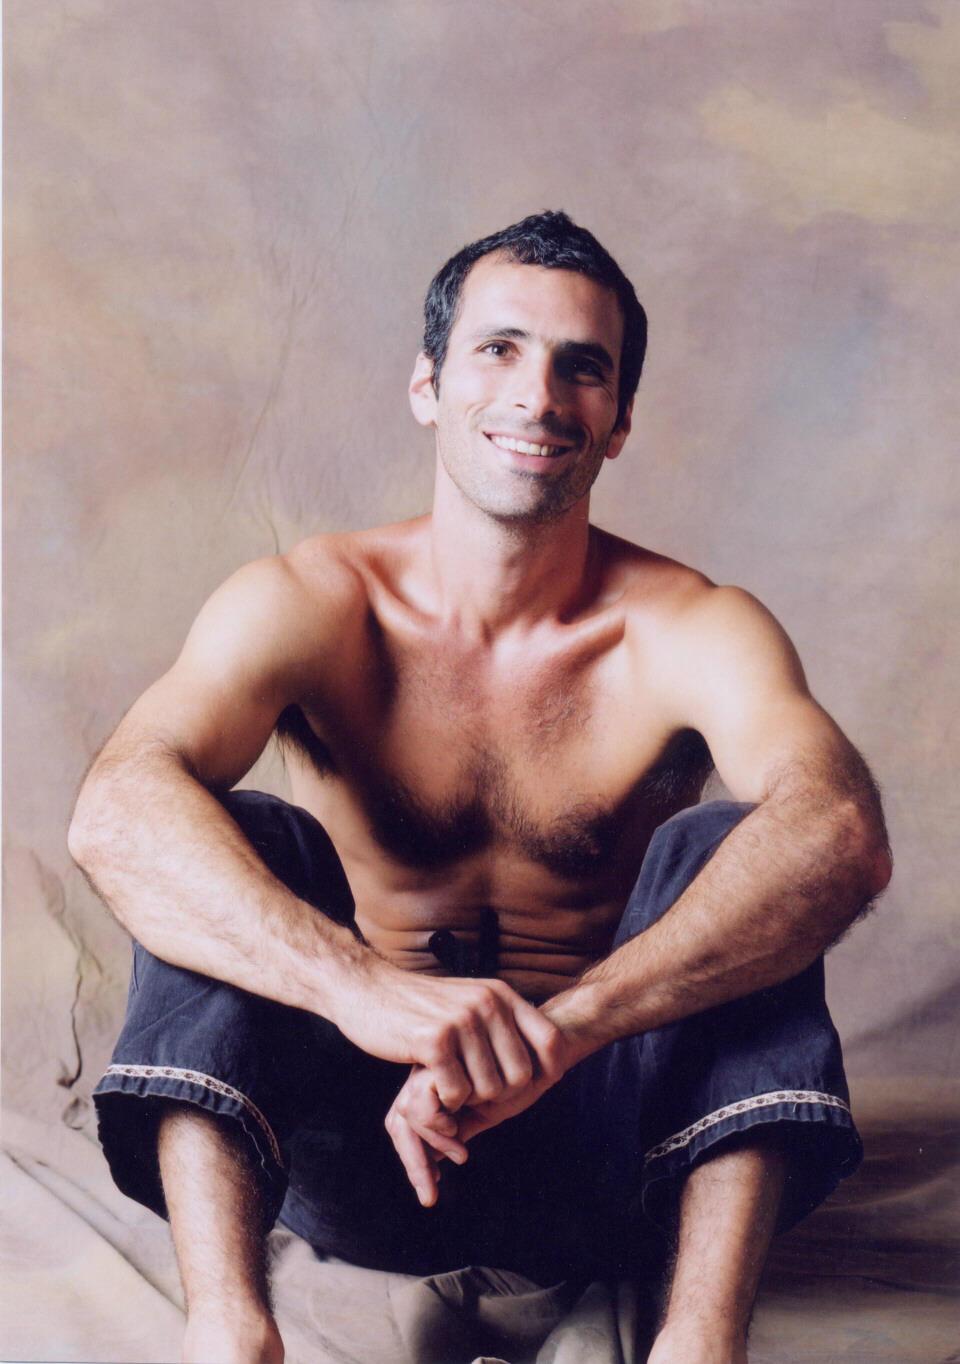 Power Yoga Bryan Kest Smile